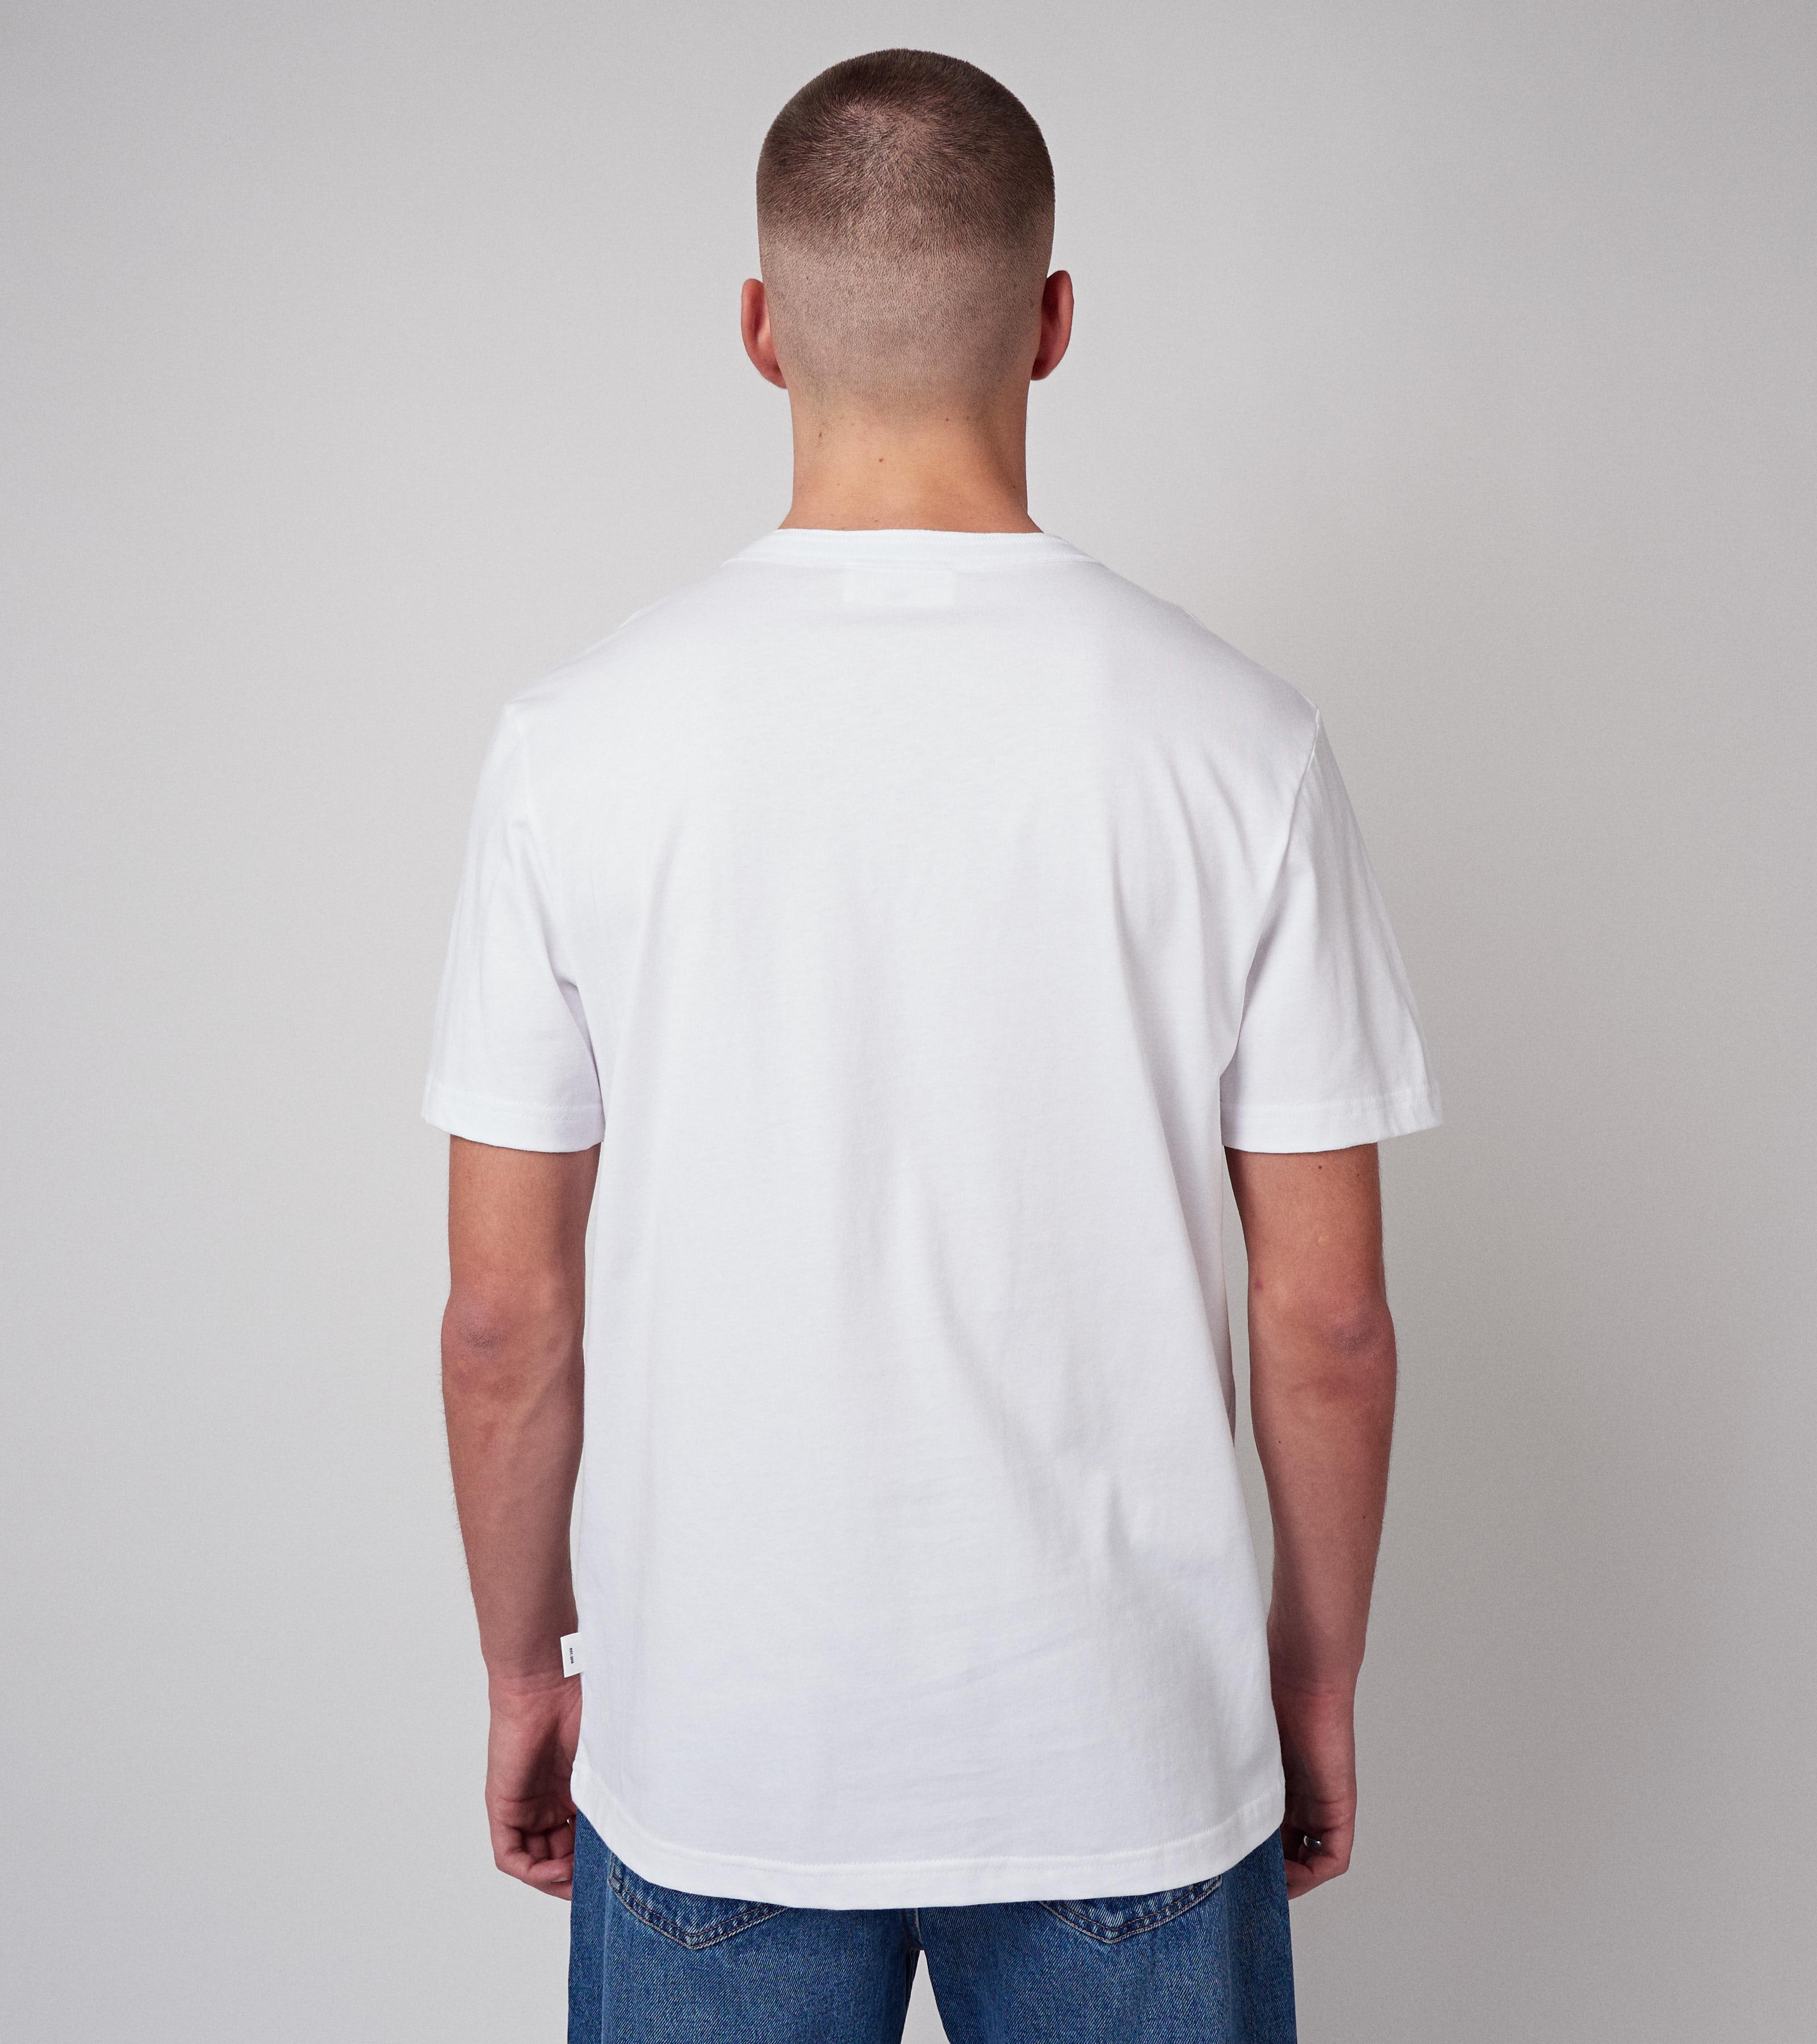 Dan Tee Virgin White